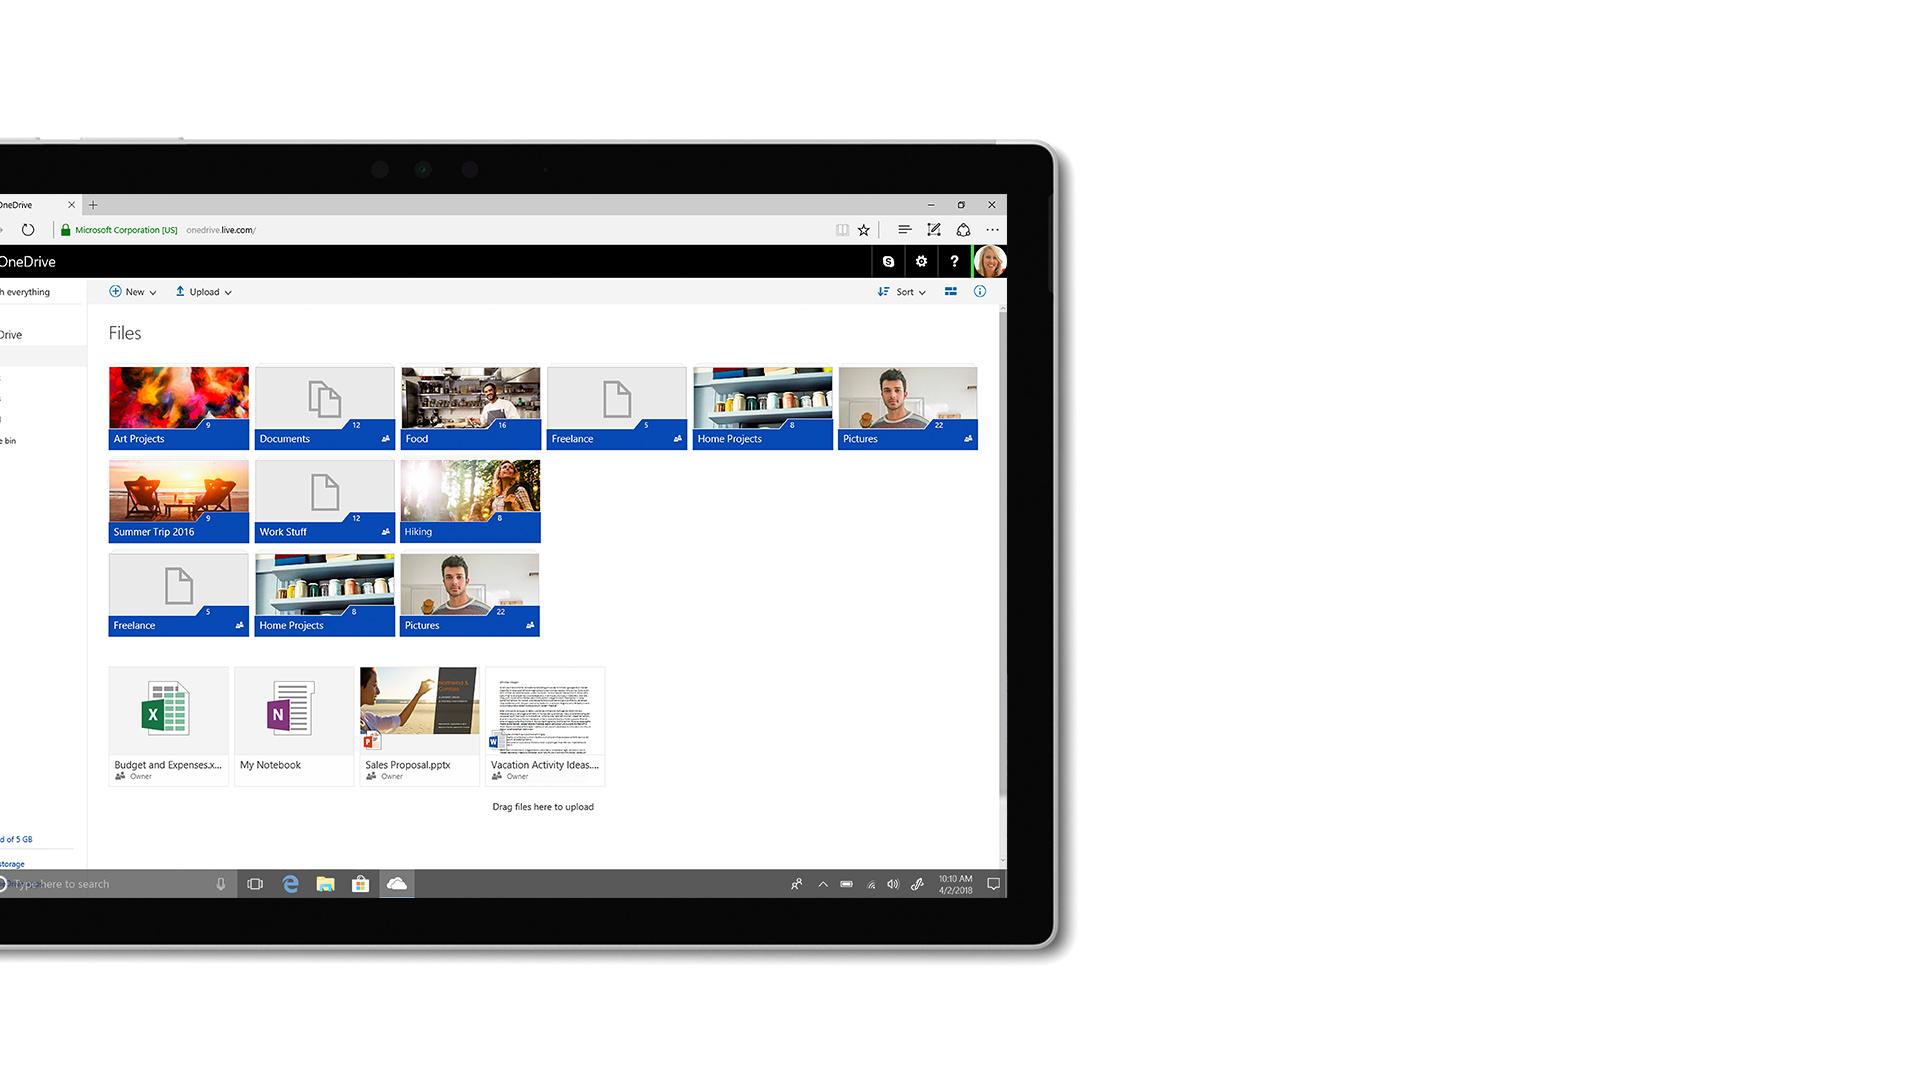 Imagen de la interfaz de usuario de Microsoft OneDrive